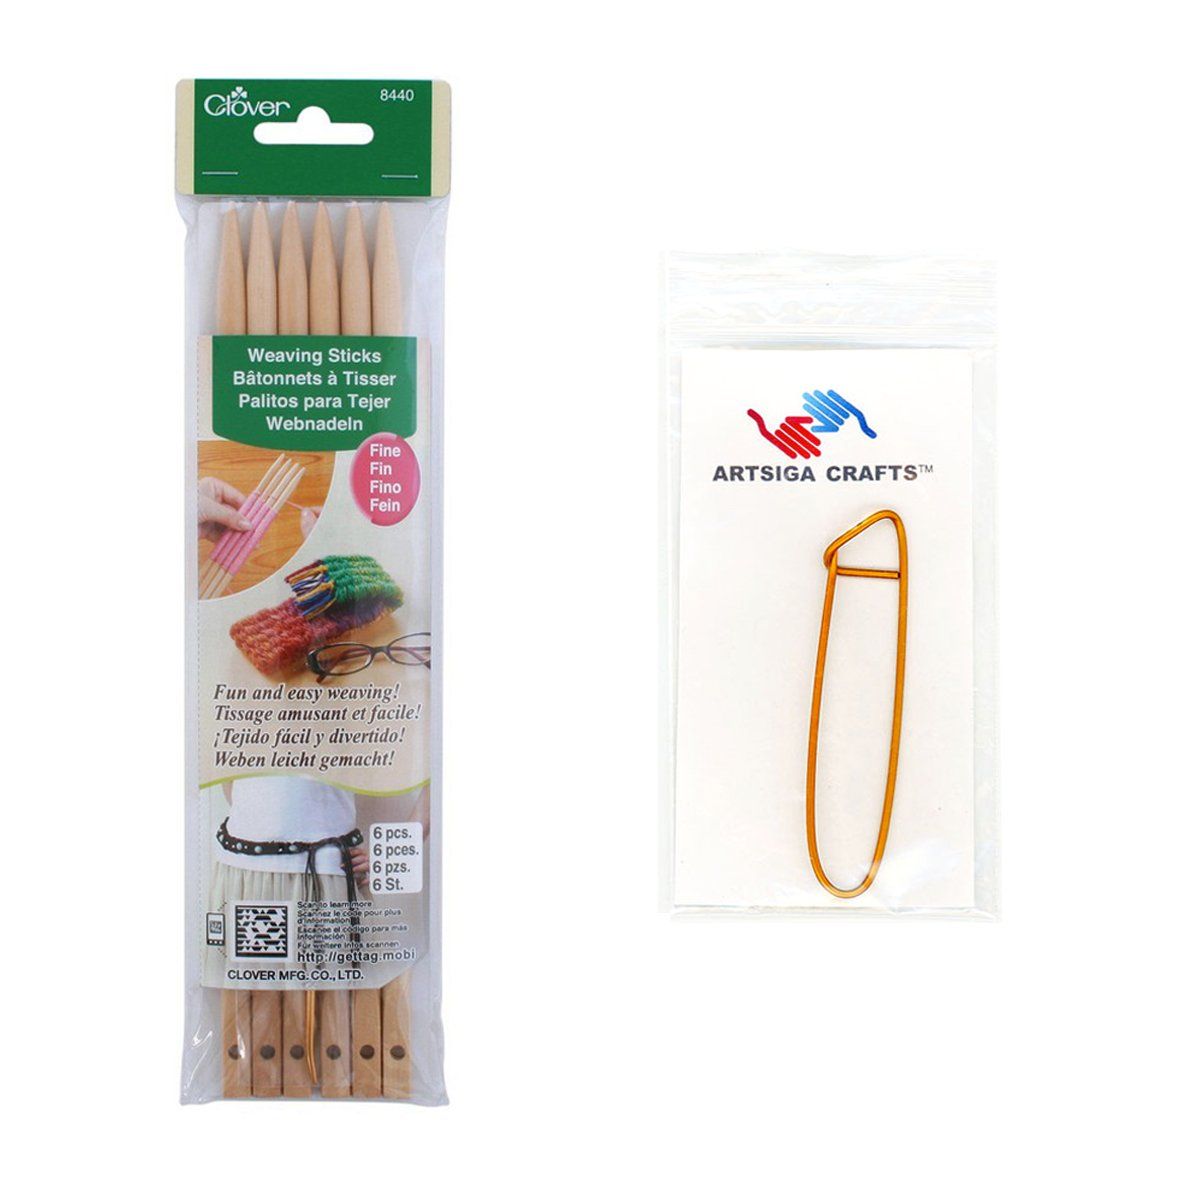 Clover Weaving Sticks-Fine Bundle with 1 Artsiga Crafts Stitch Holder 8440